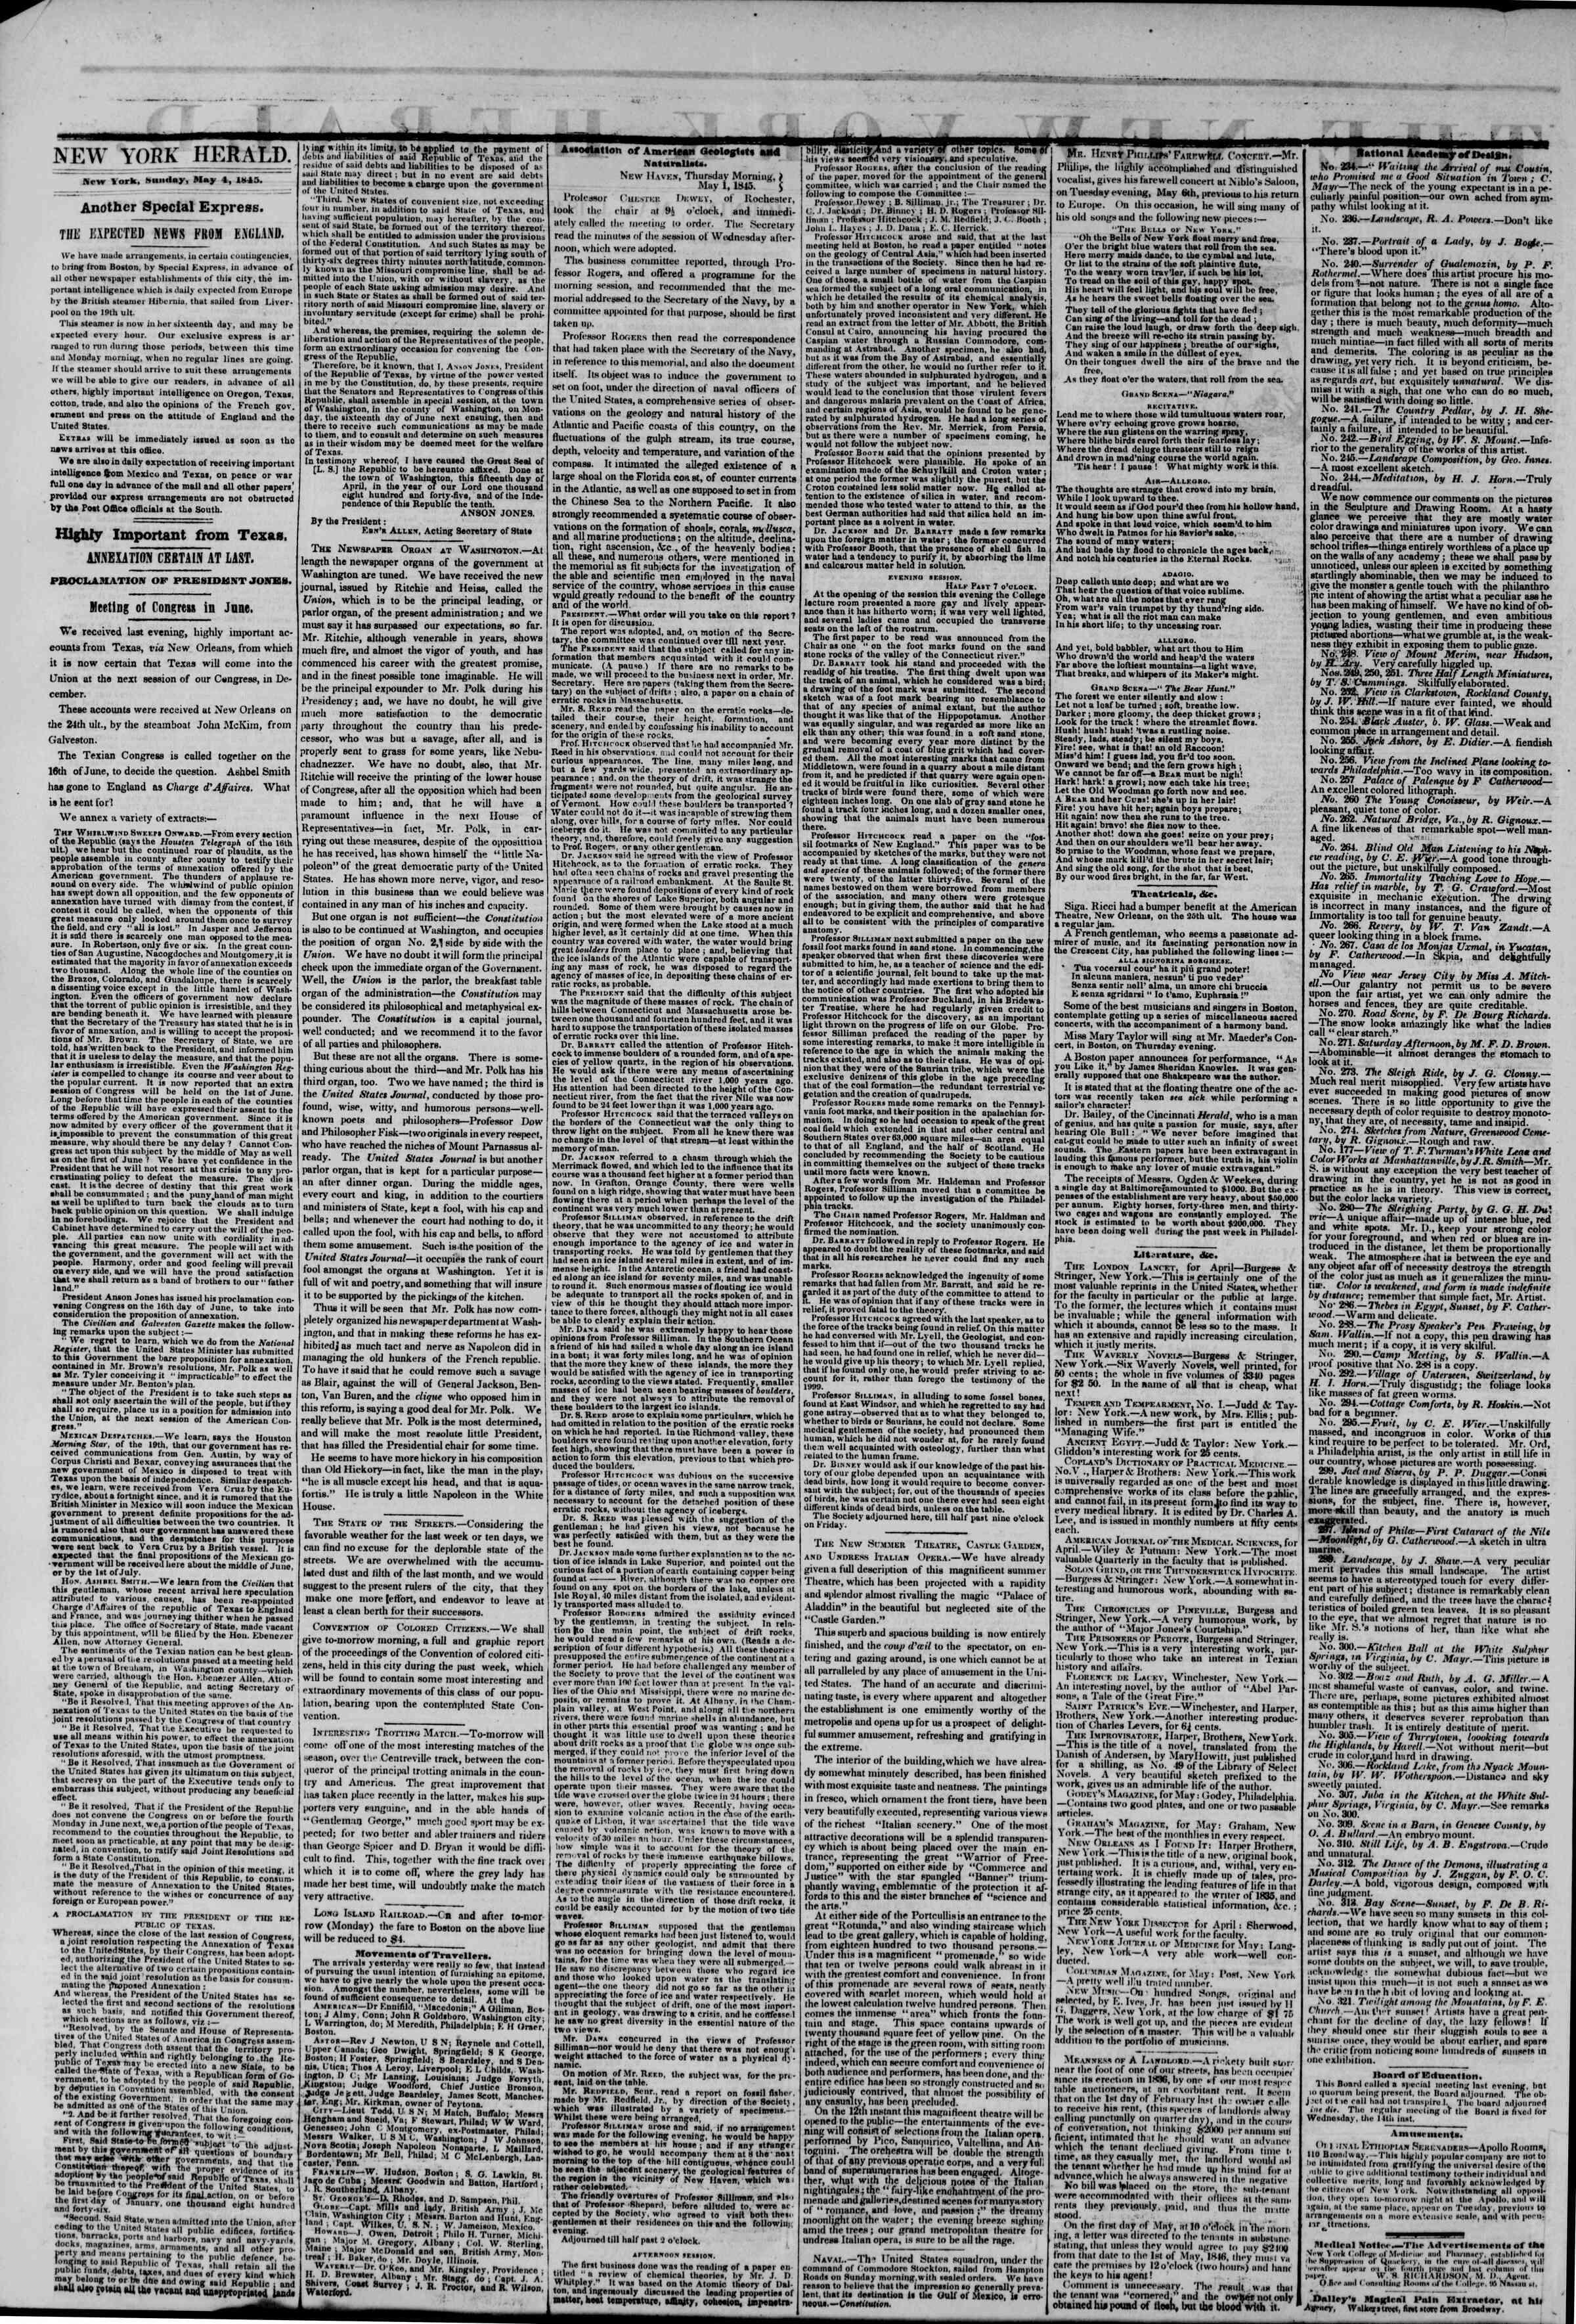 May 4, 1845 Tarihli The New York Herald Gazetesi Sayfa 2